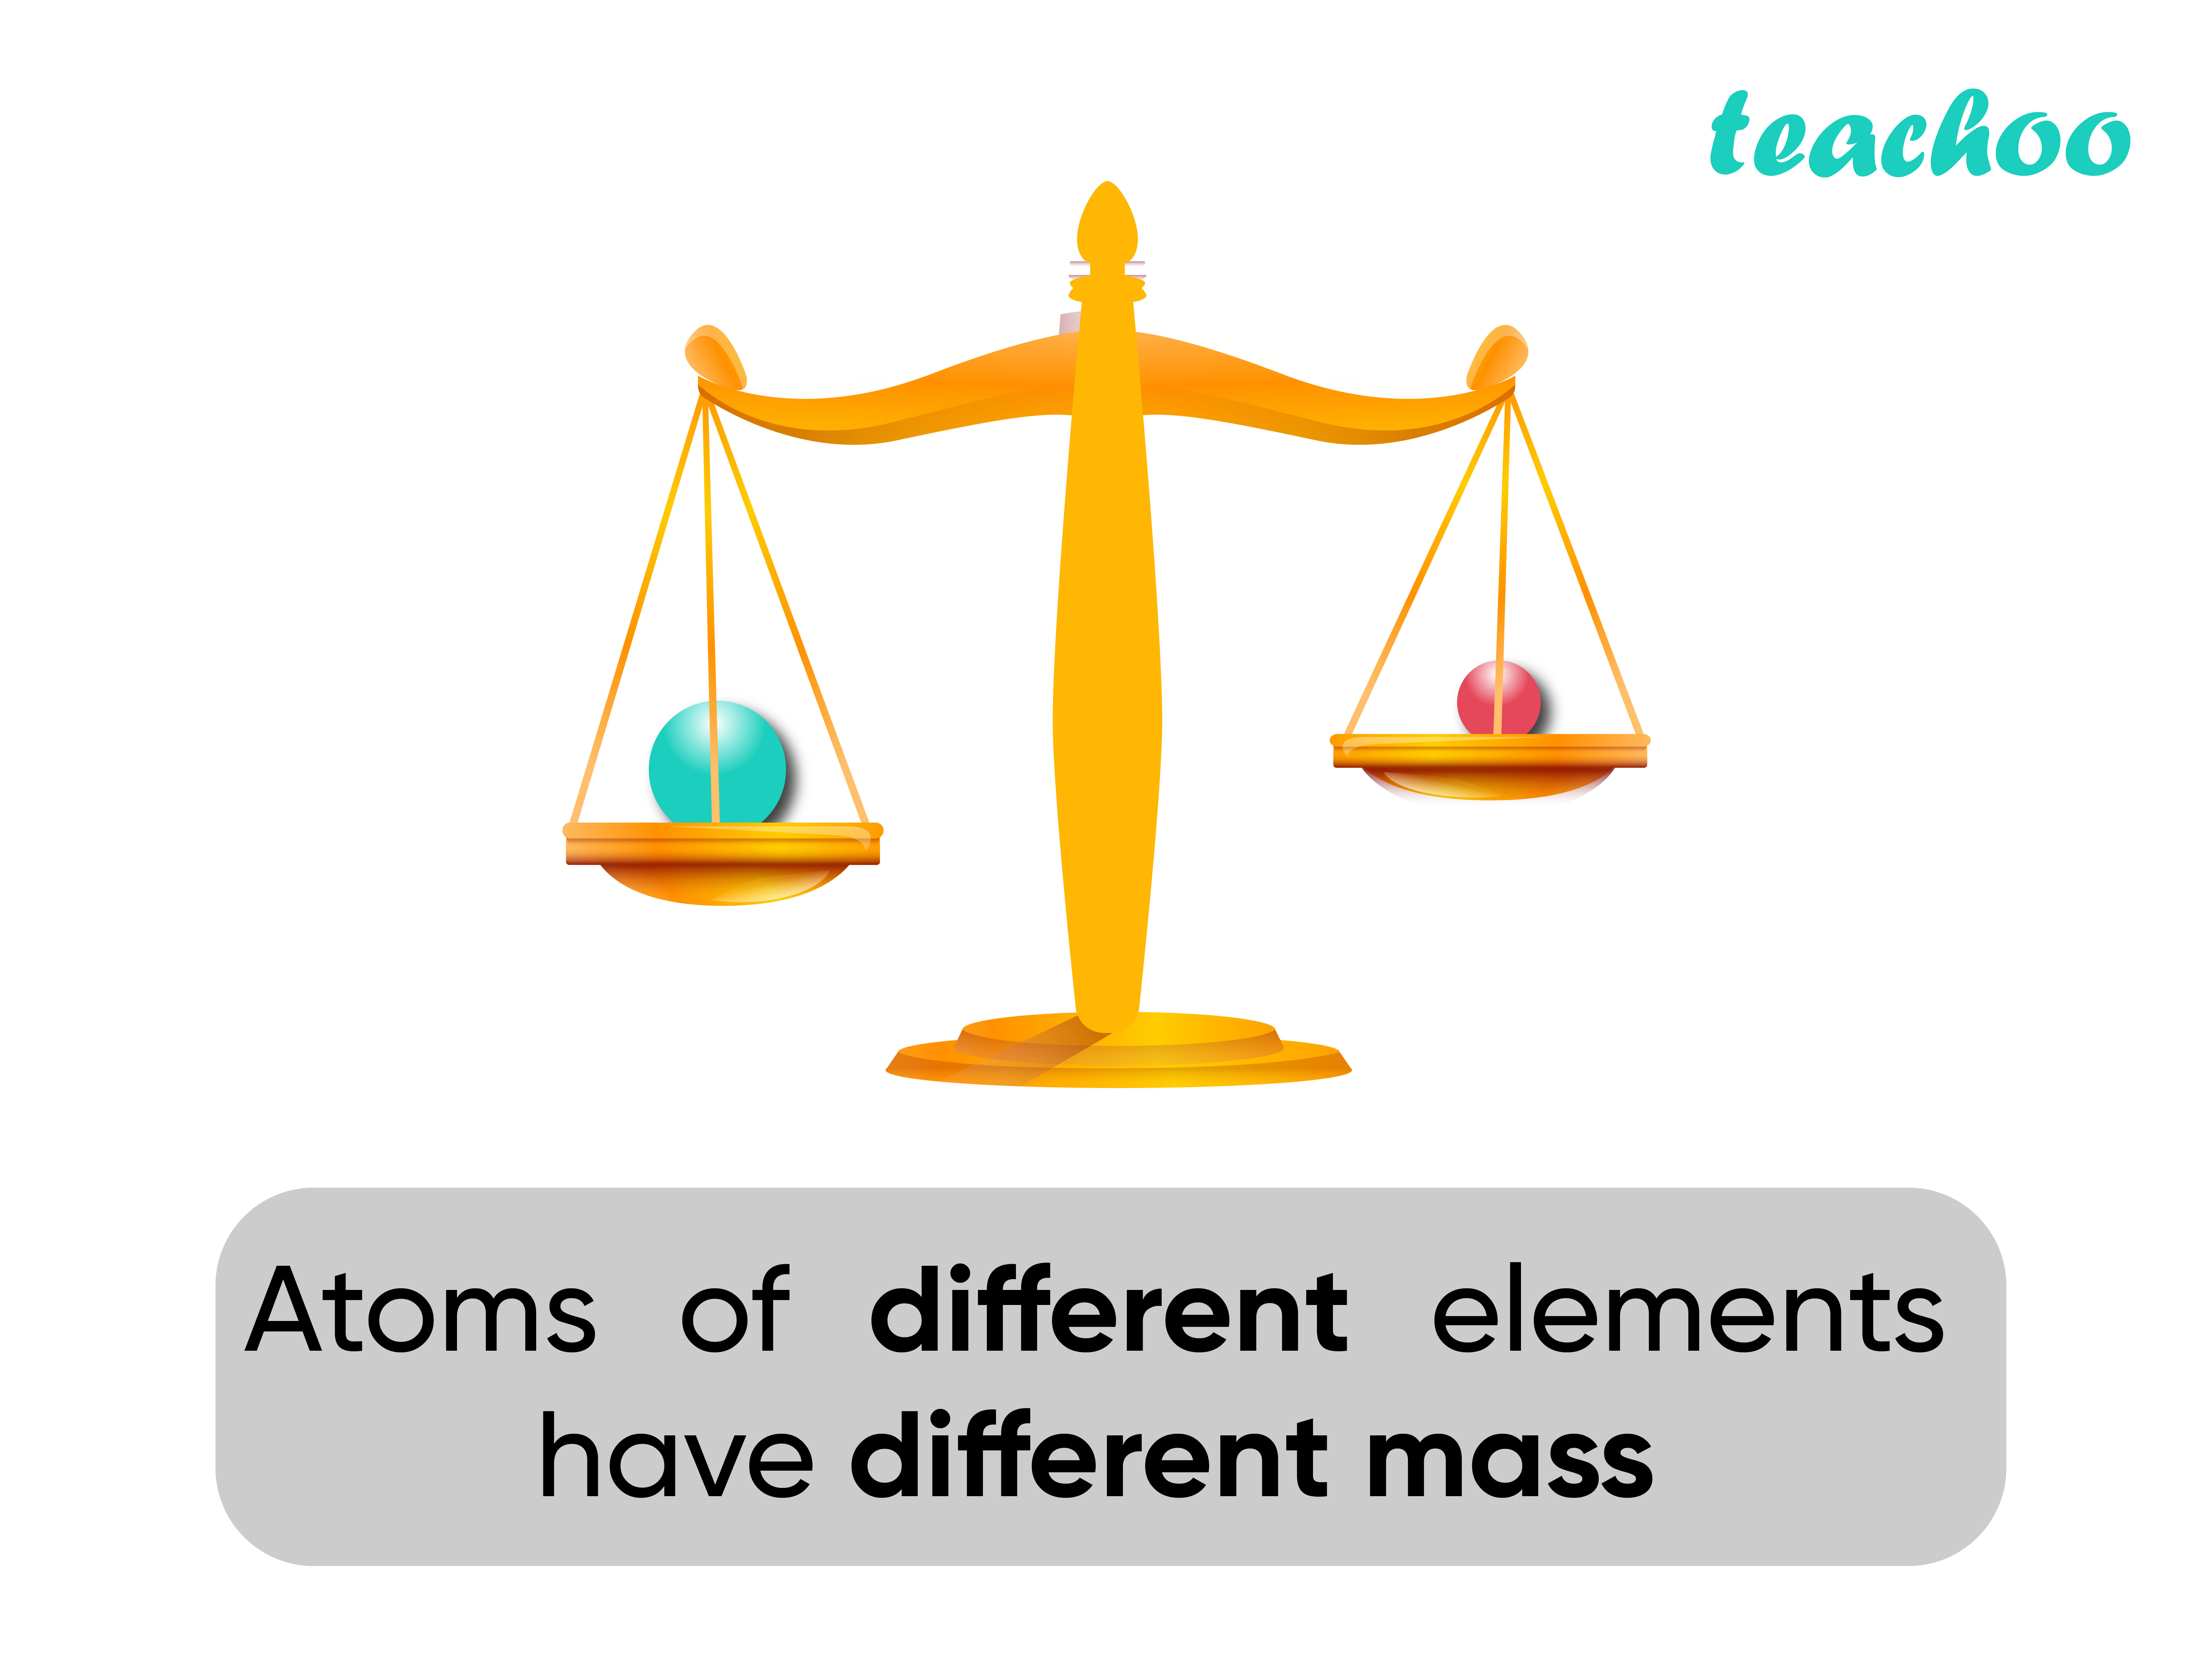 Dalton Atomic Theory (Different Mass) - Teachoo-01-01.jpg